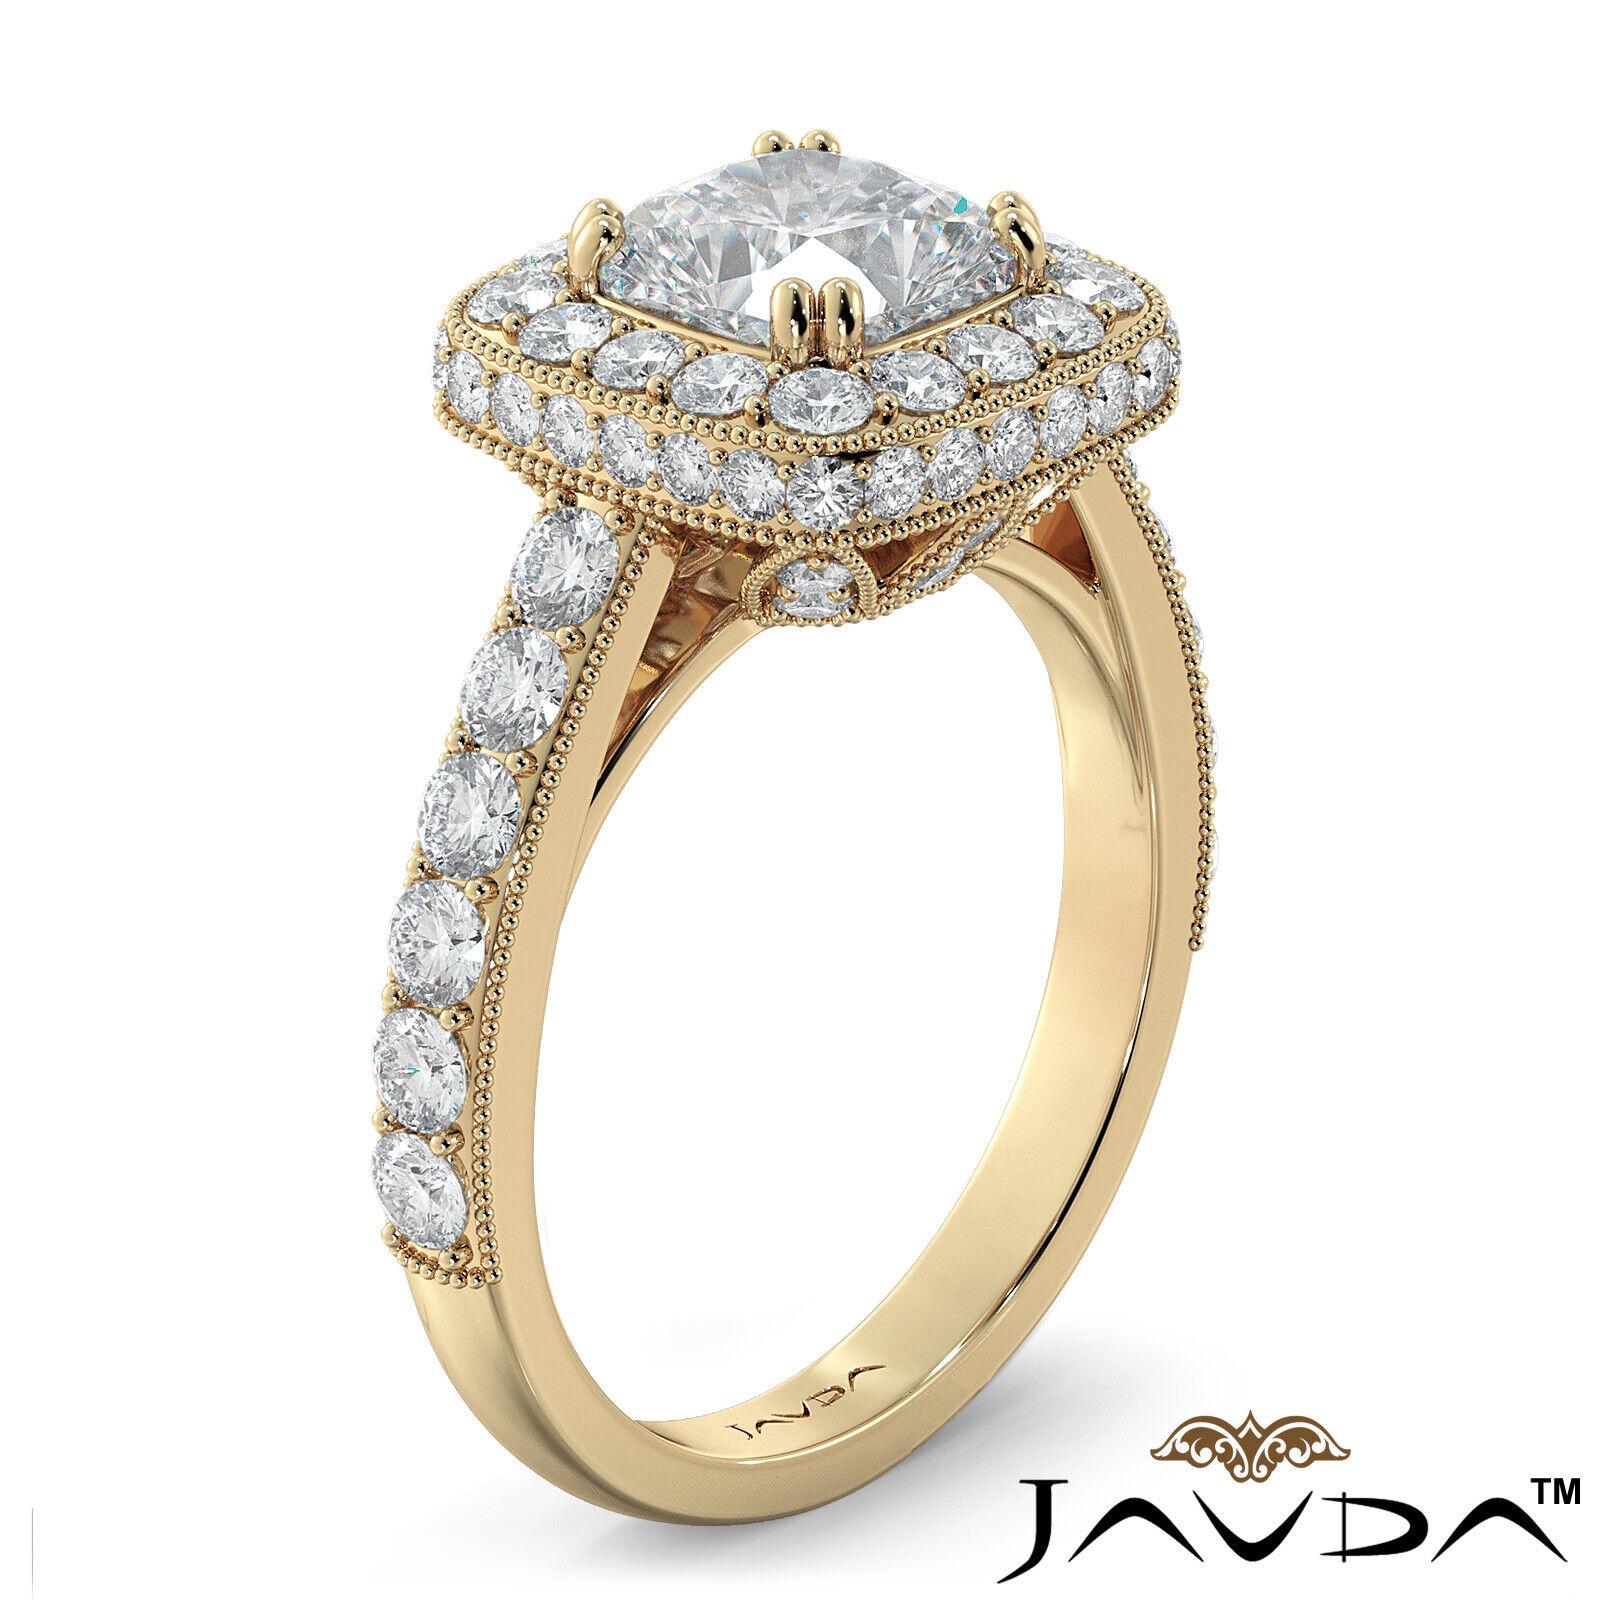 1.94ctw Milgrain Floral Basket Cushion Diamond Engagement Ring GIA E-VVS1 W Gold 8